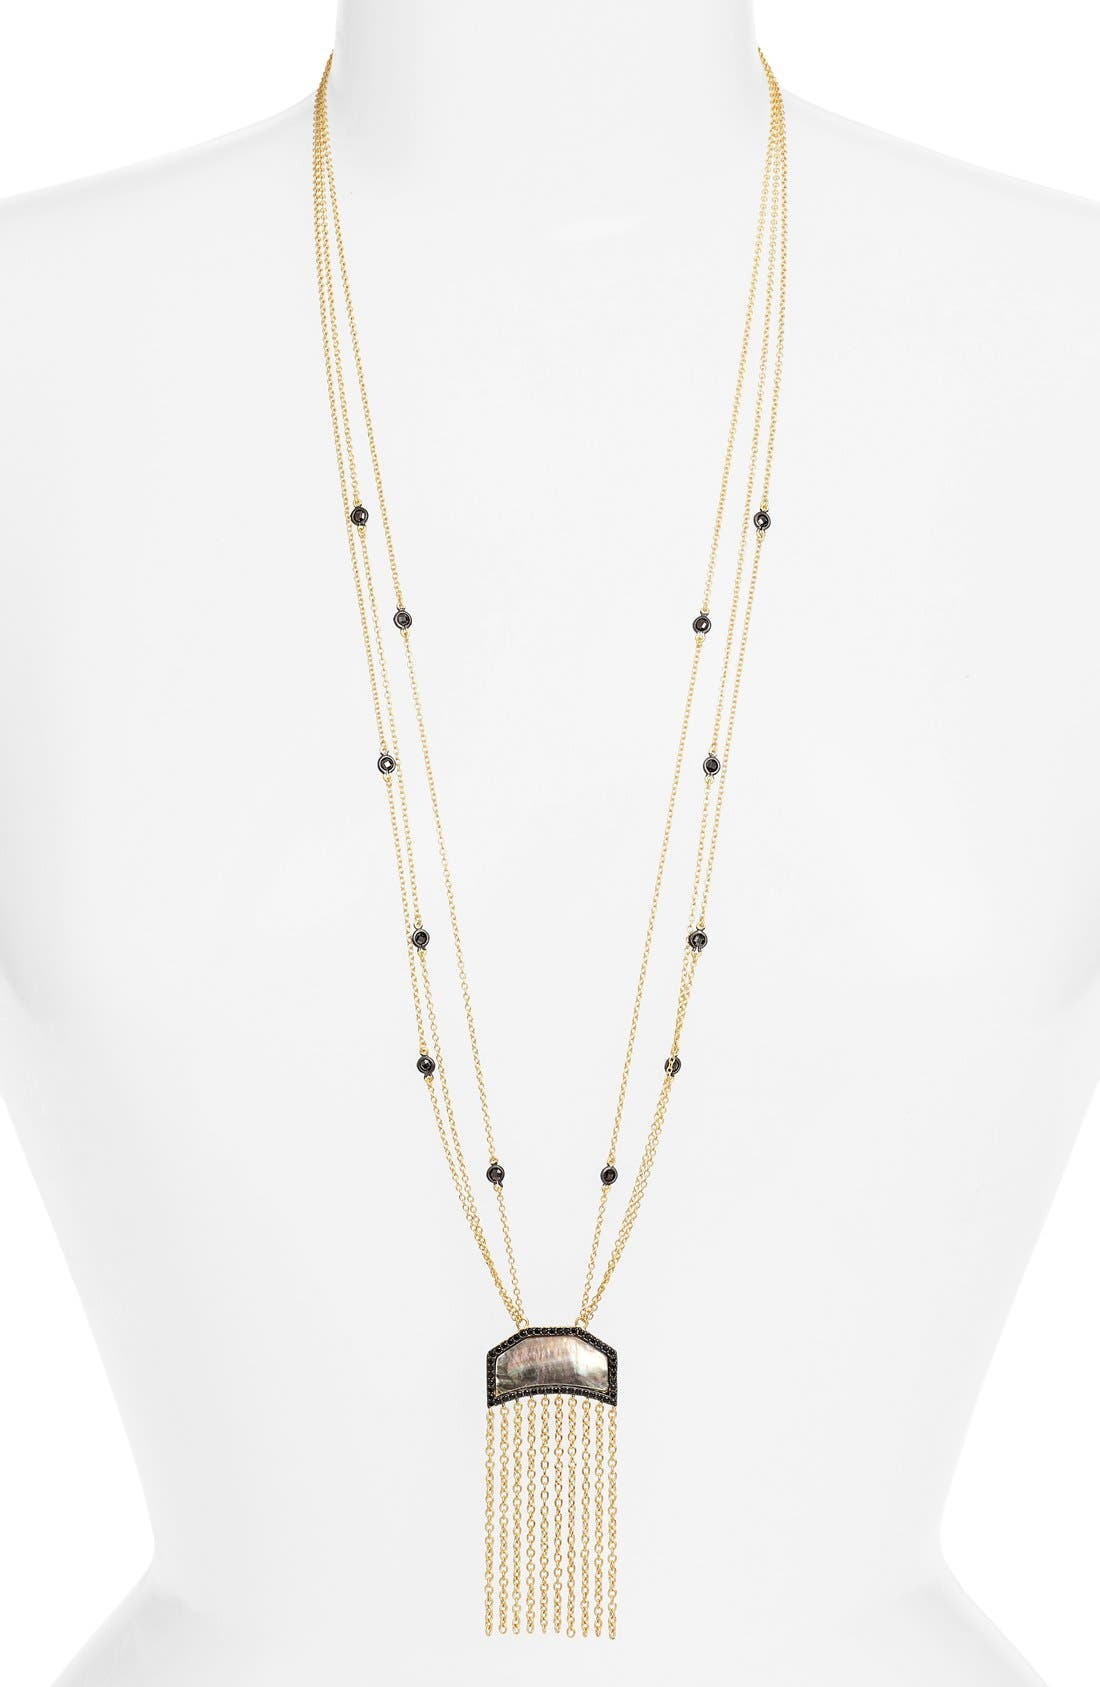 Image of Freida Rothman Two-Tone Flat Fringe CZ & Mother of Pearl Pendant Necklace